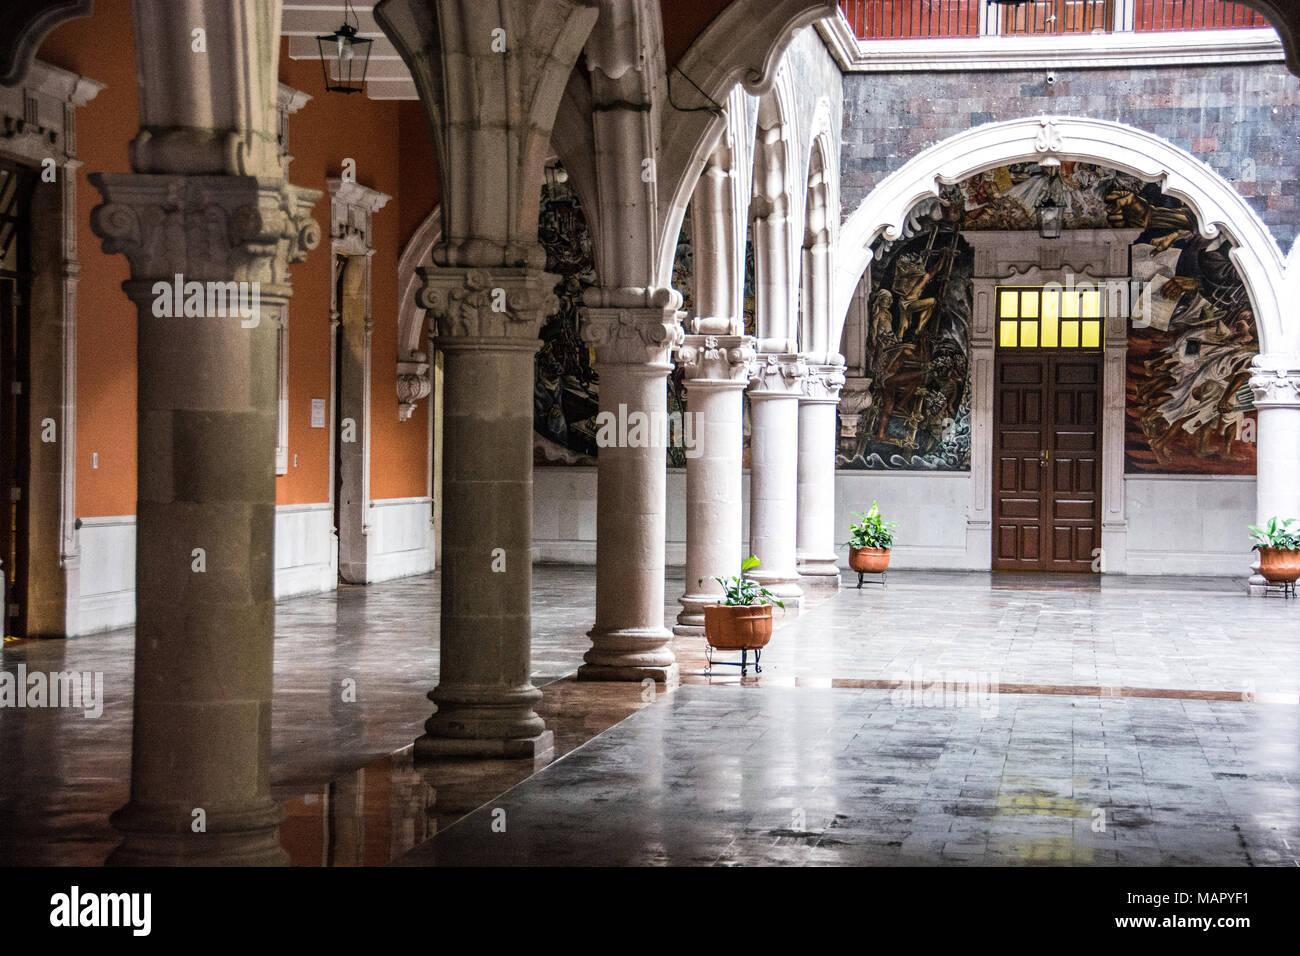 Casa de la Cultura, House of Culture, Aguascalientes, Mexico - Stock Image